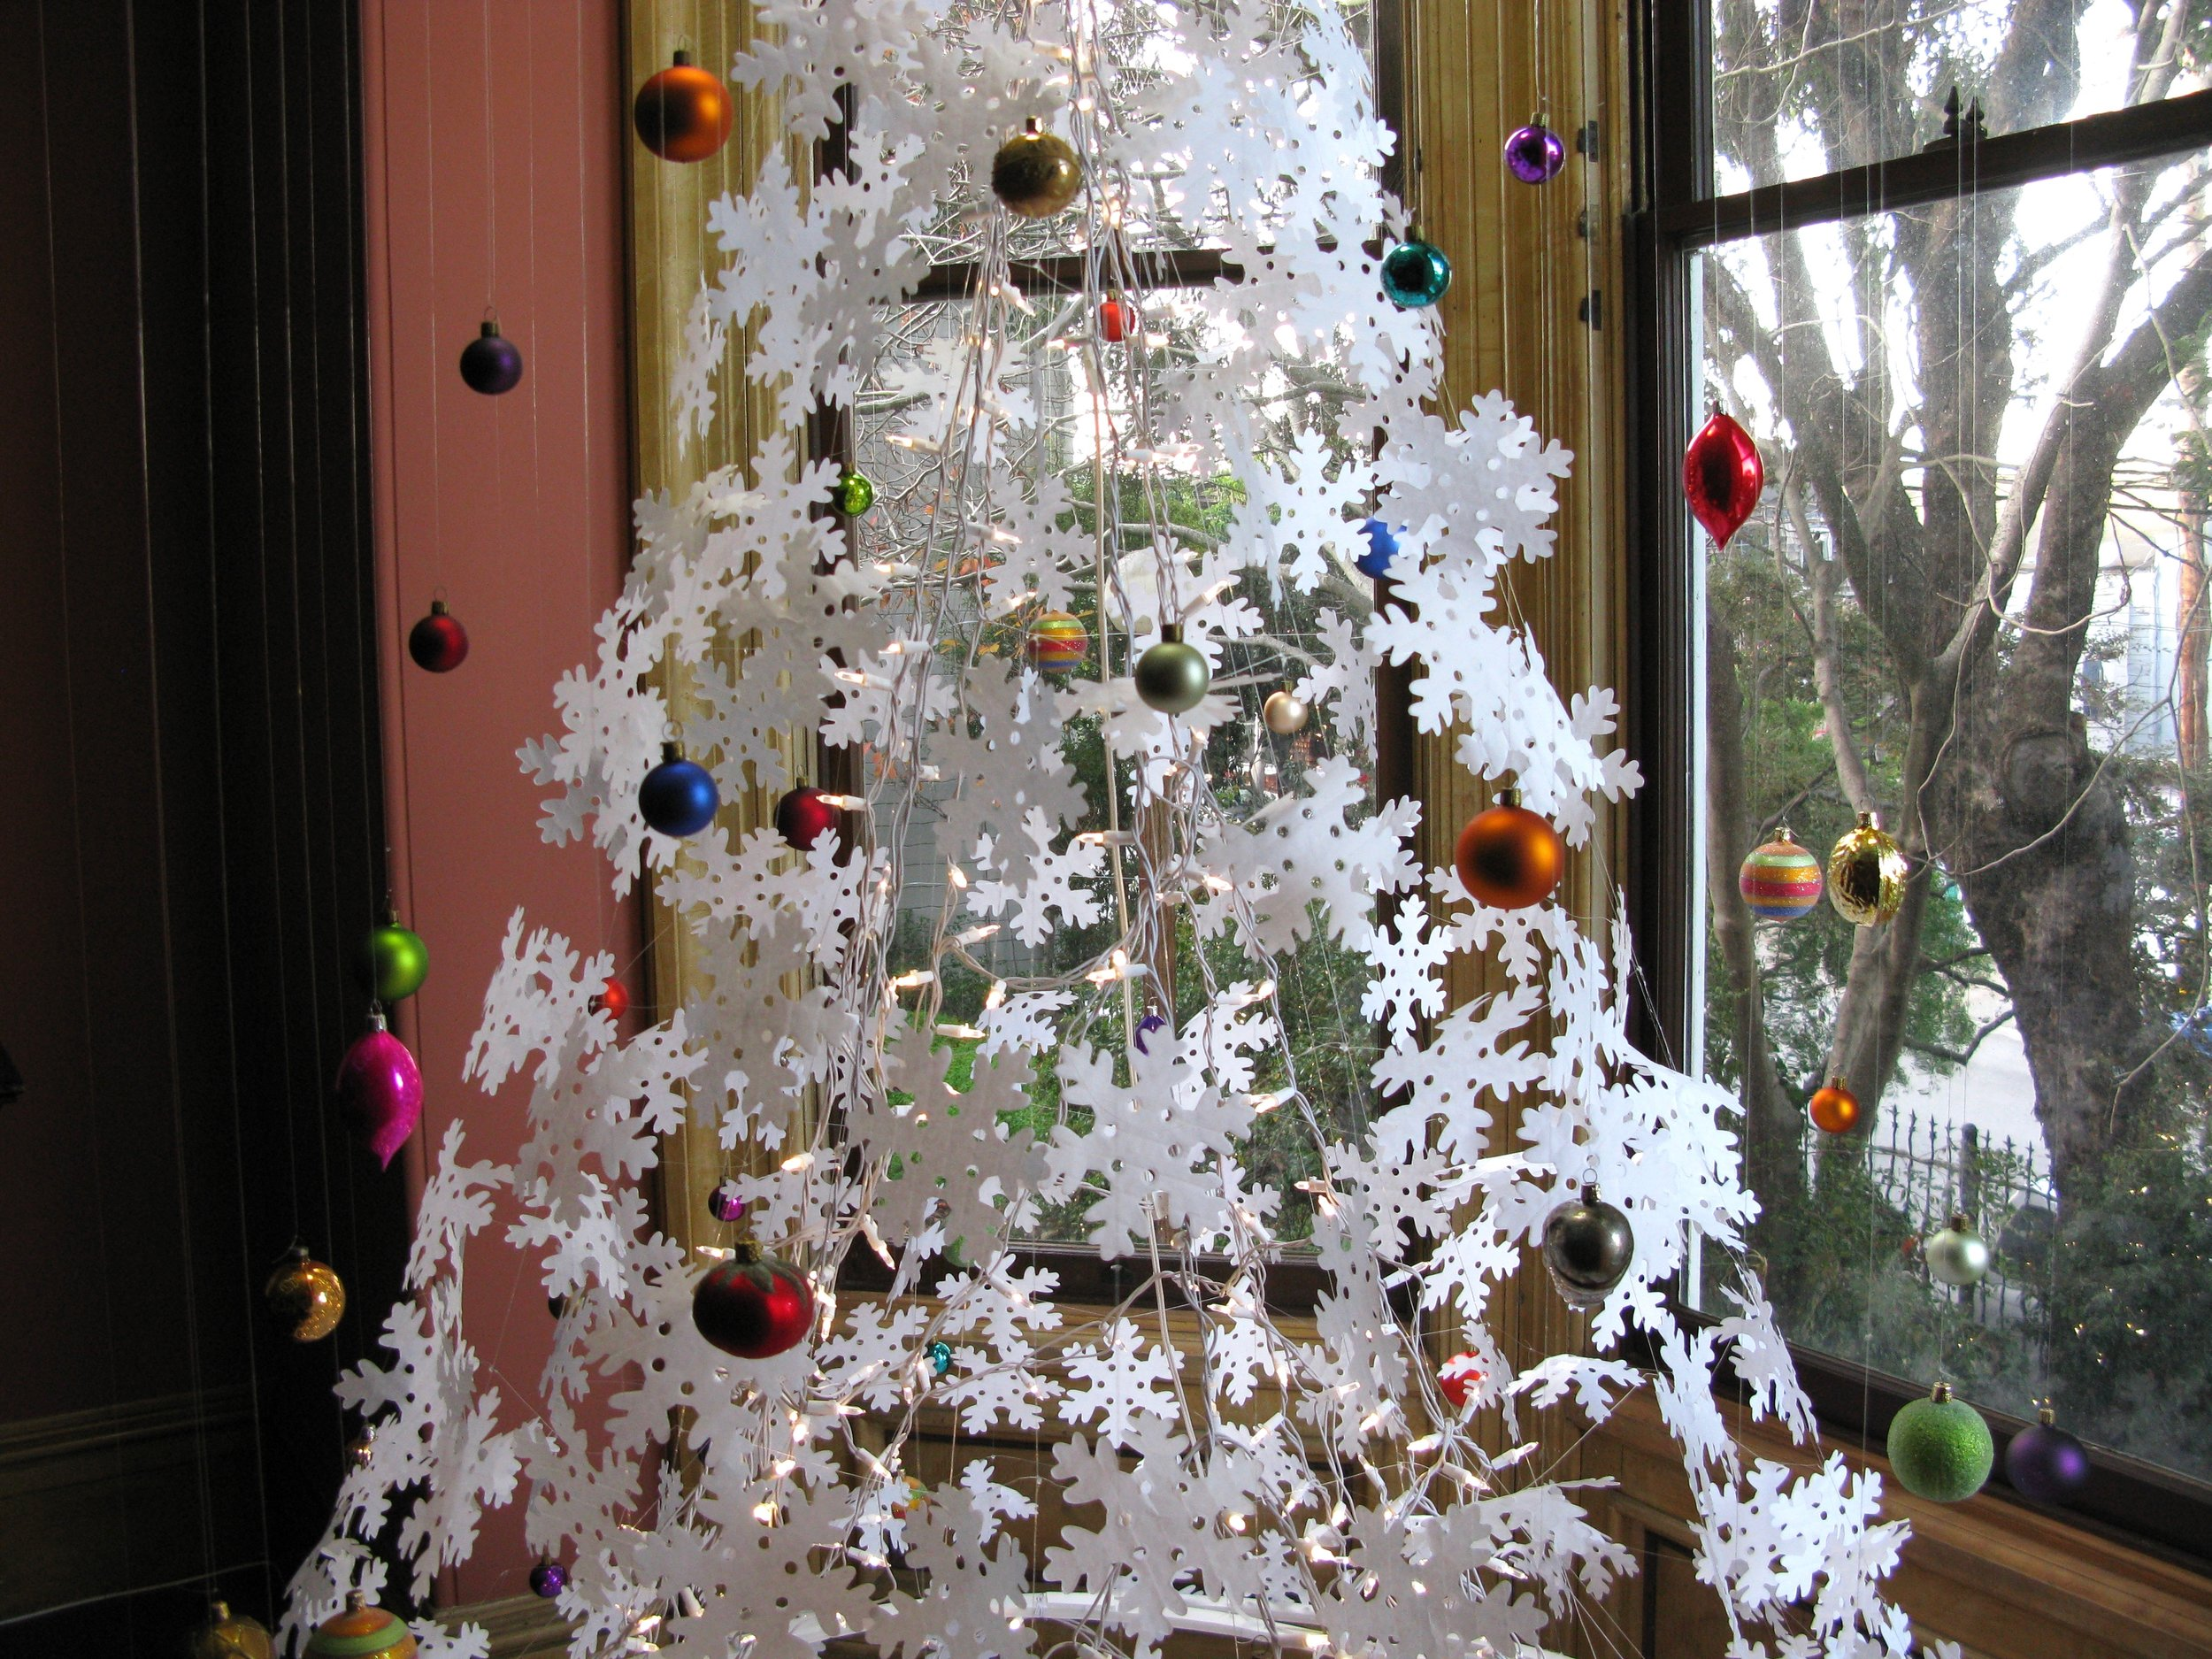 Ornament suspension close-up